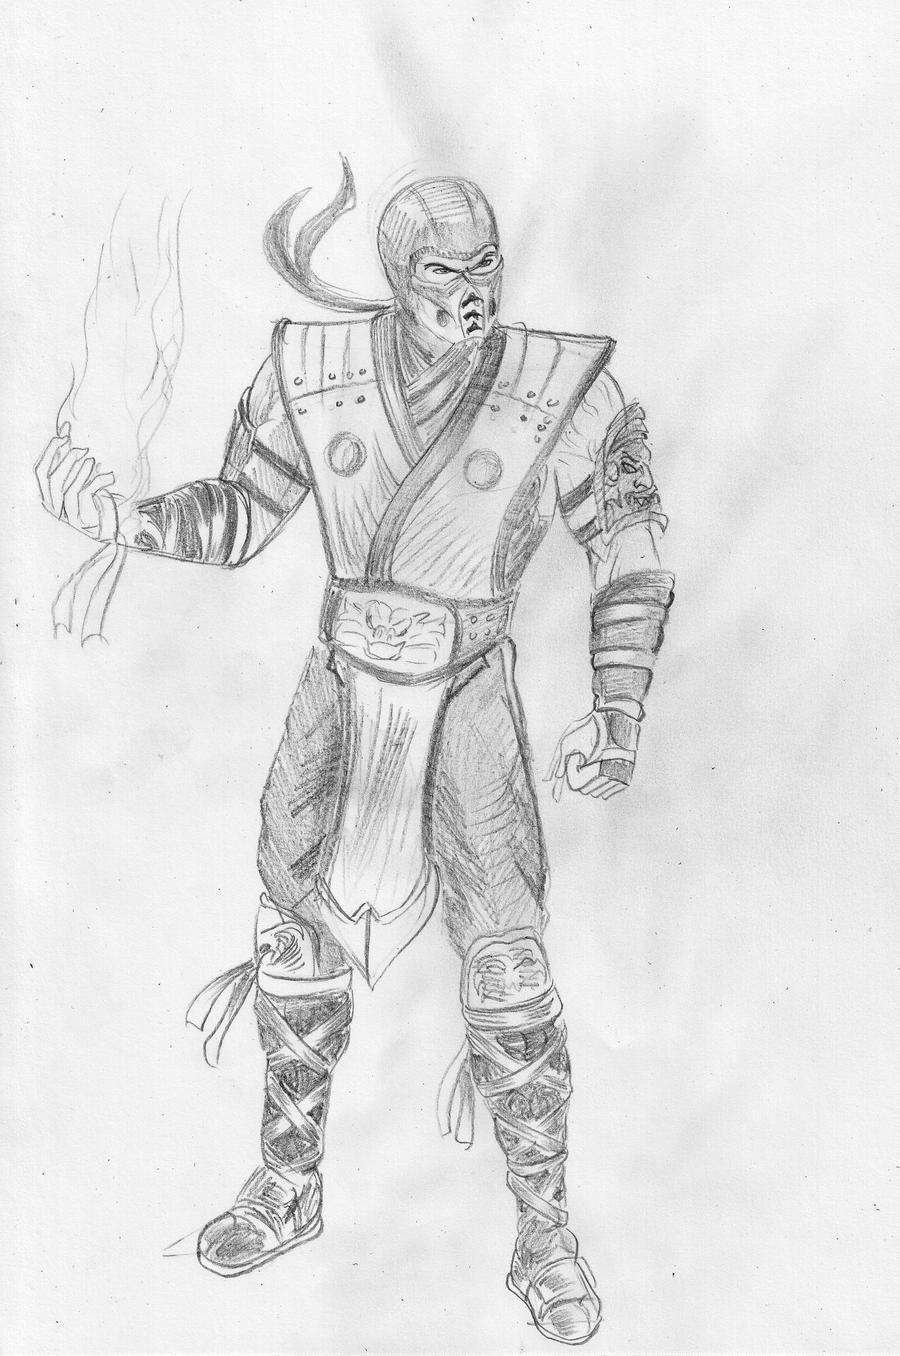 Mortal Kombat 2011 Sub-zero by gamerfan2000 on DeviantArt